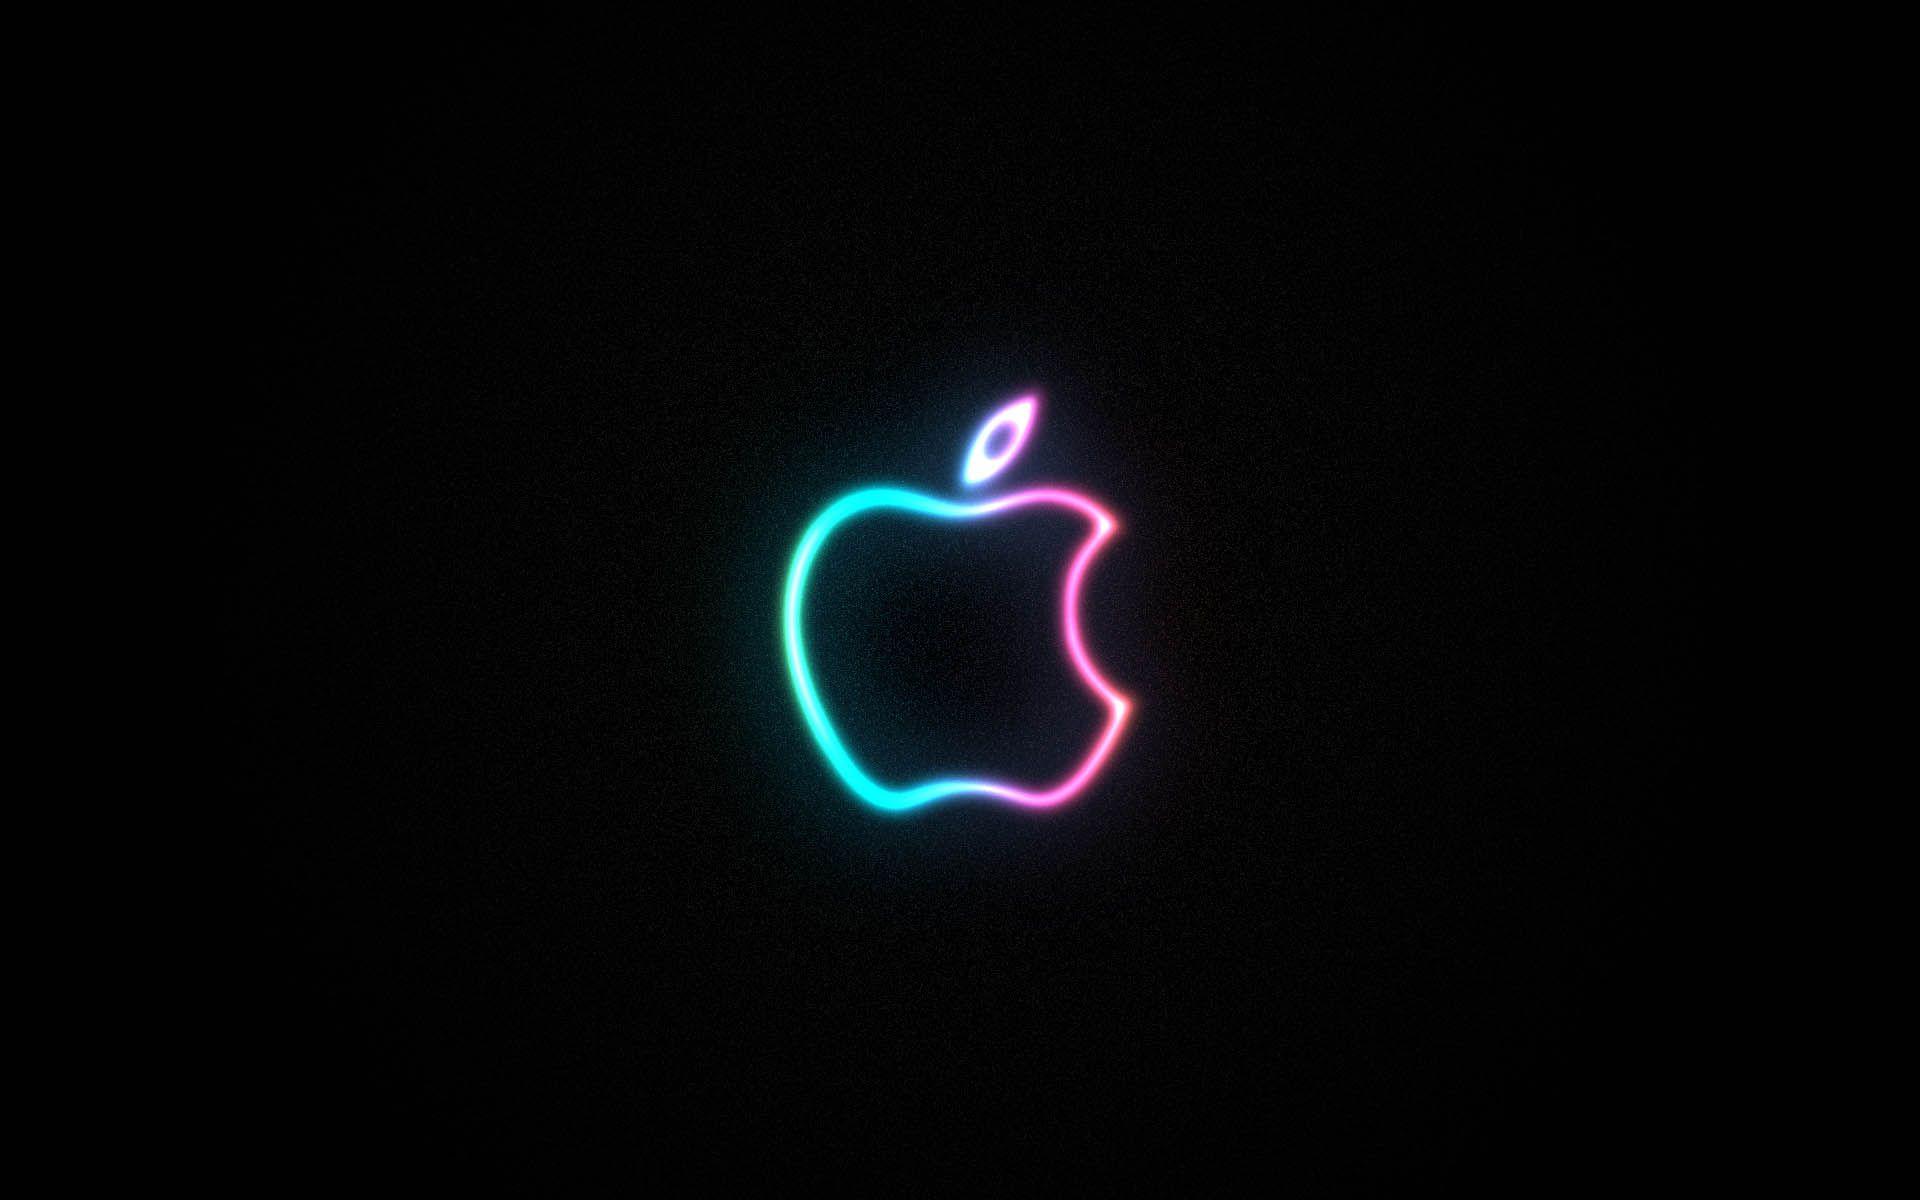 1366x768 apple logo flower - photo #28